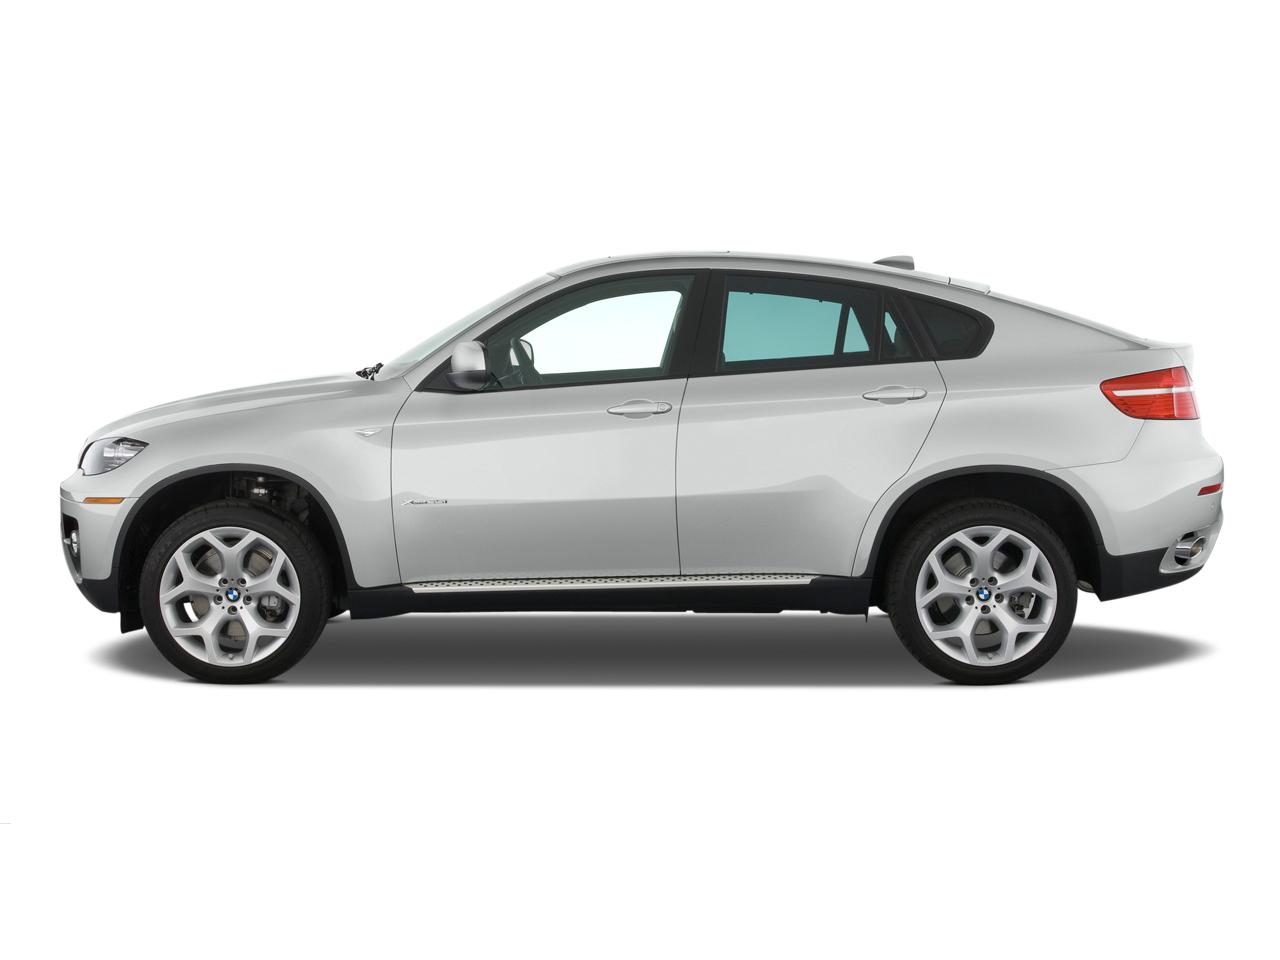 2011 BMW X6 Preview